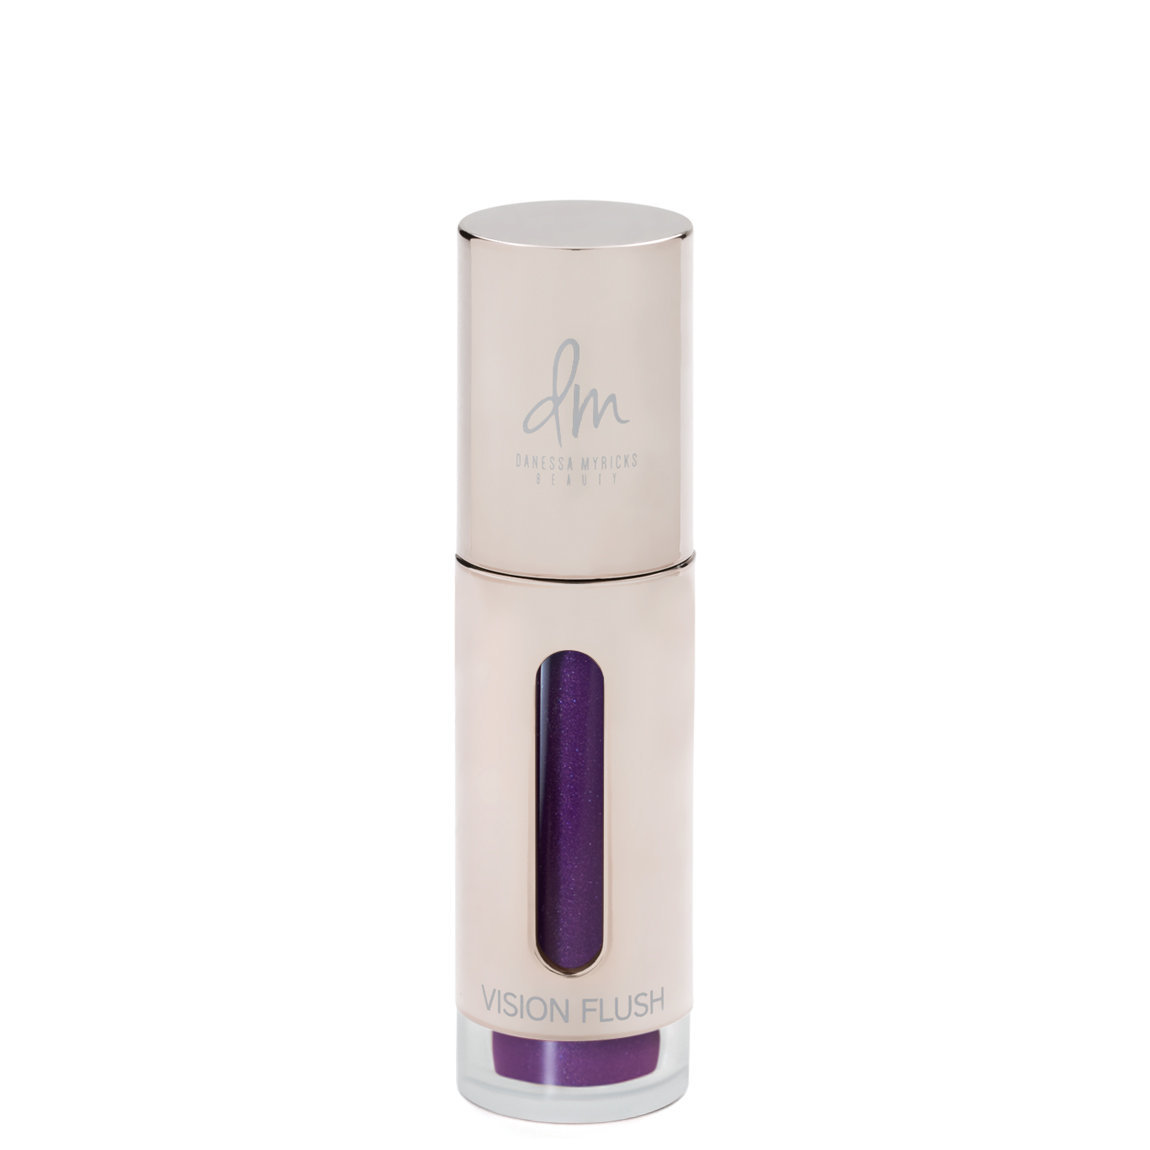 Danessa Myricks Beauty Vision Flush Grape alternative view 1.